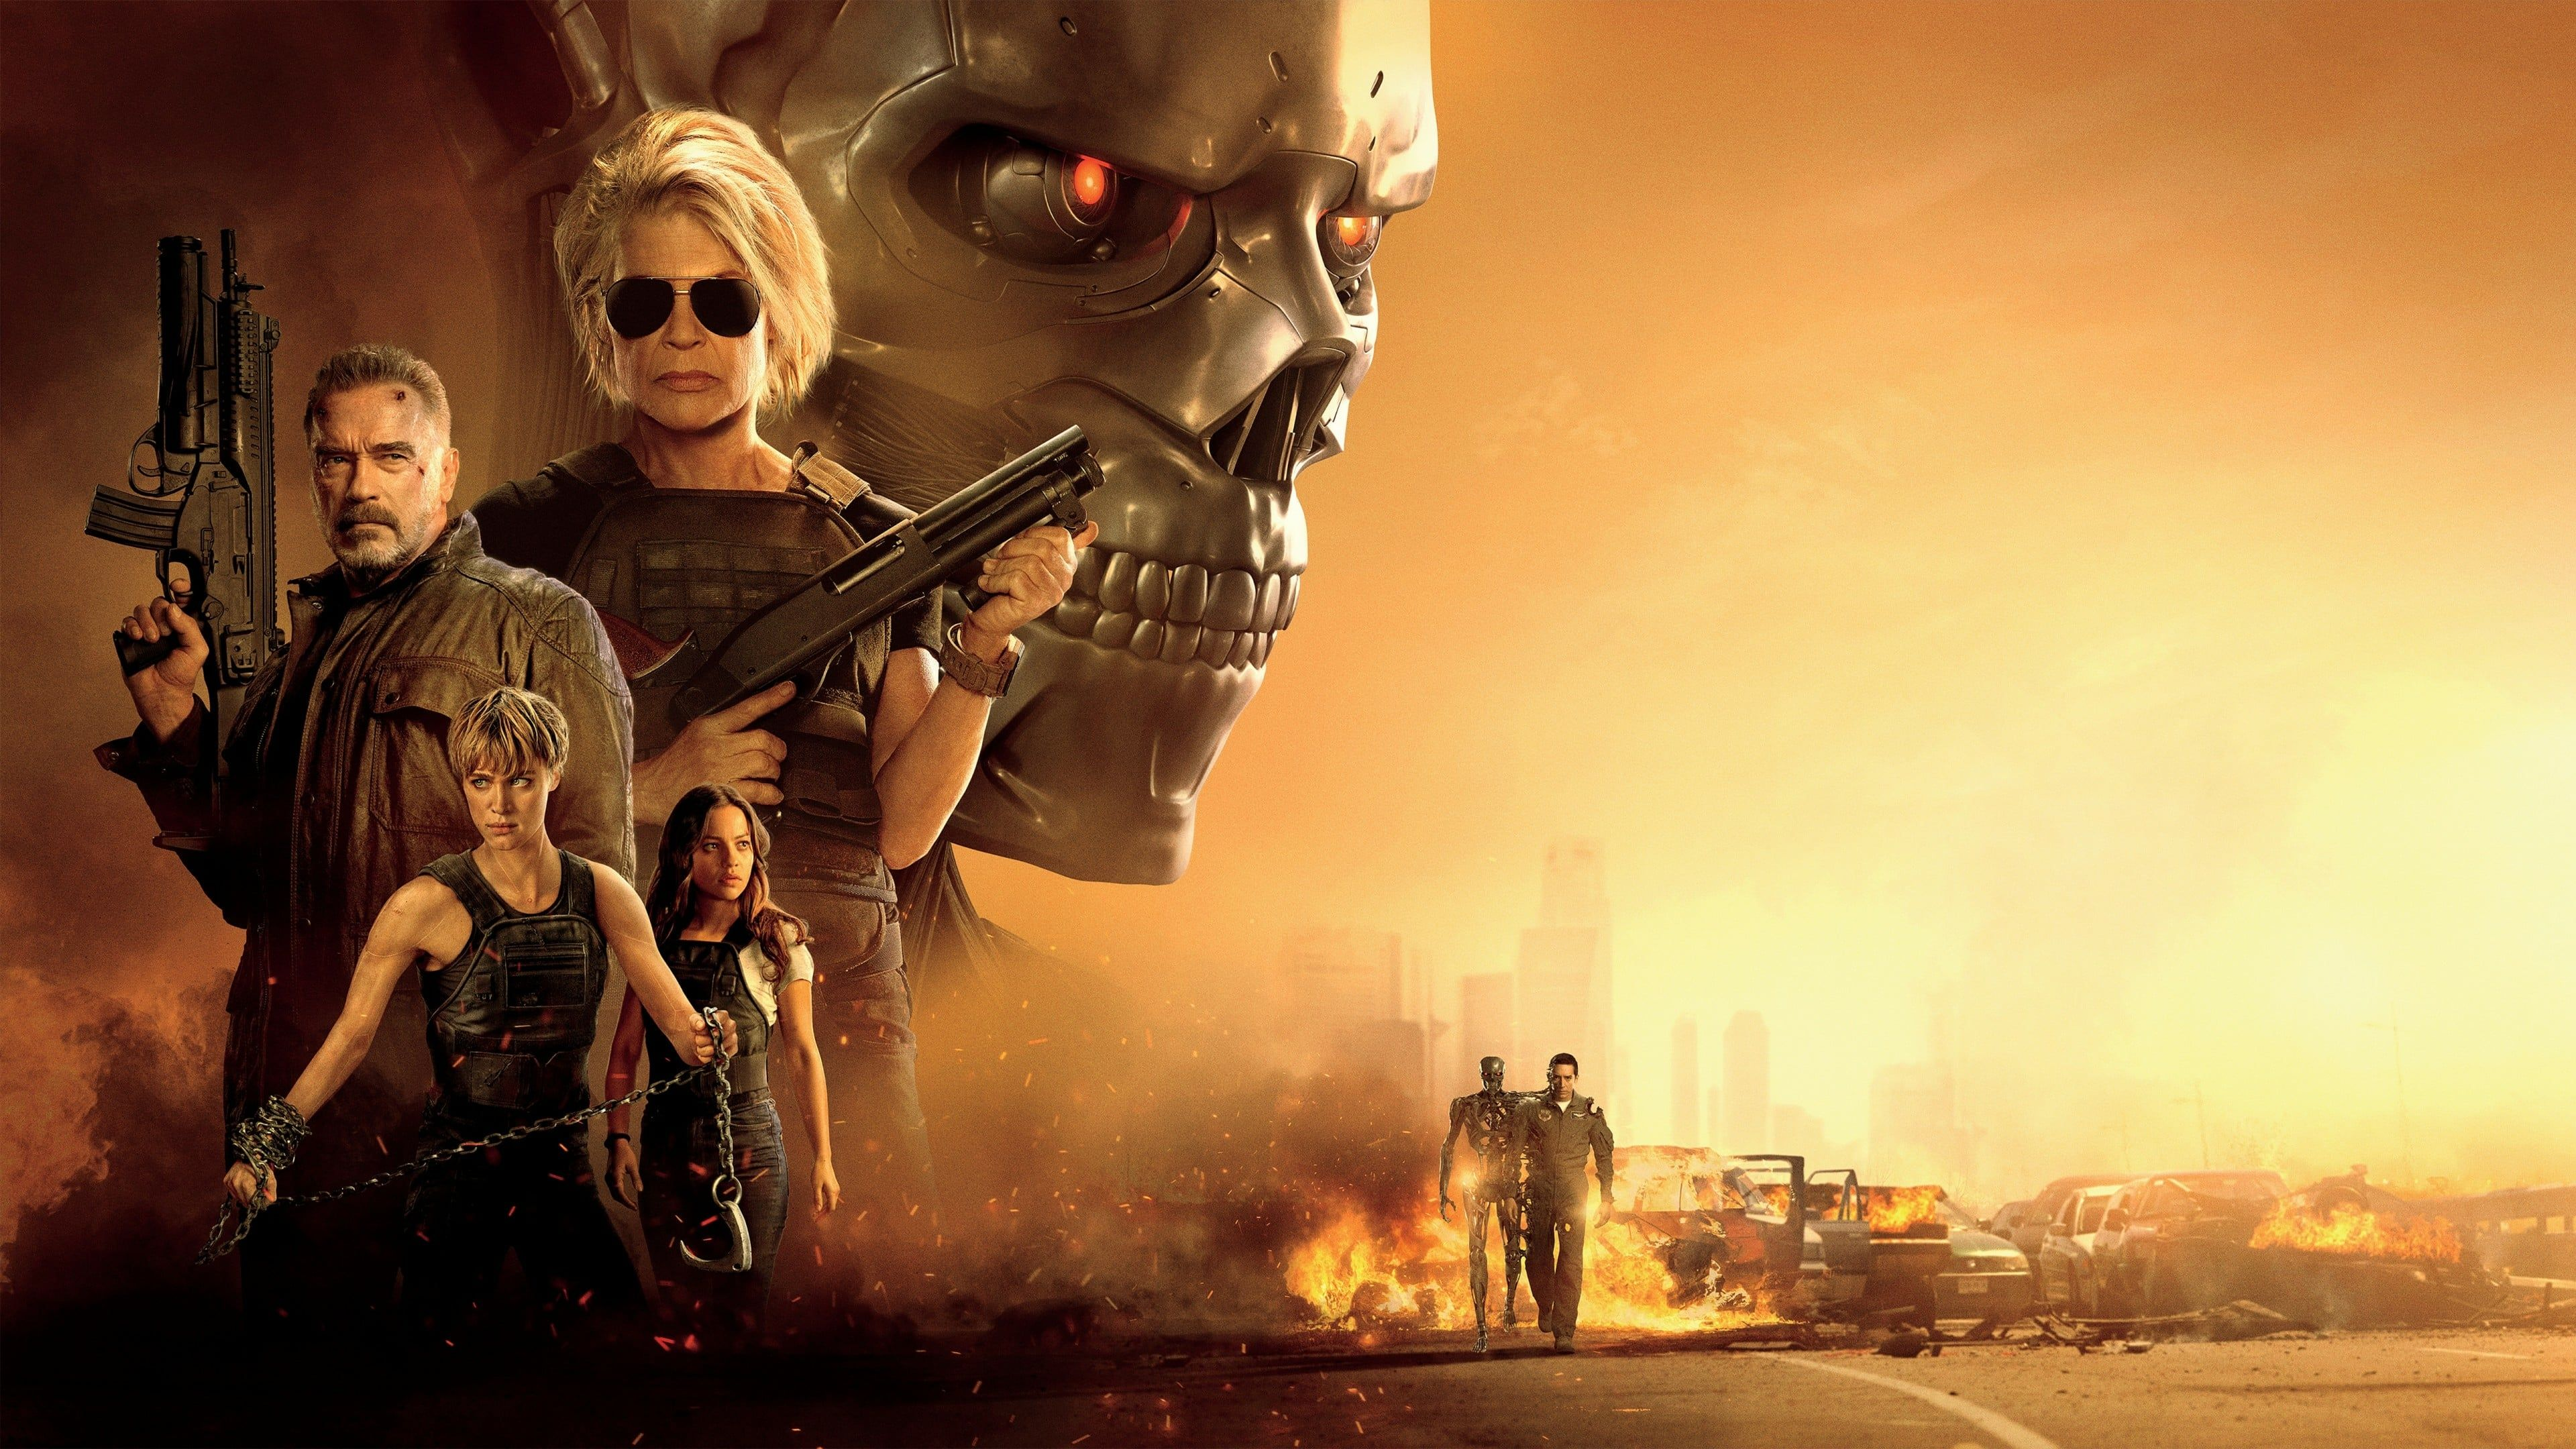 Regarder Terminator Dark Fate Film Complet En Ligne Gratuit De